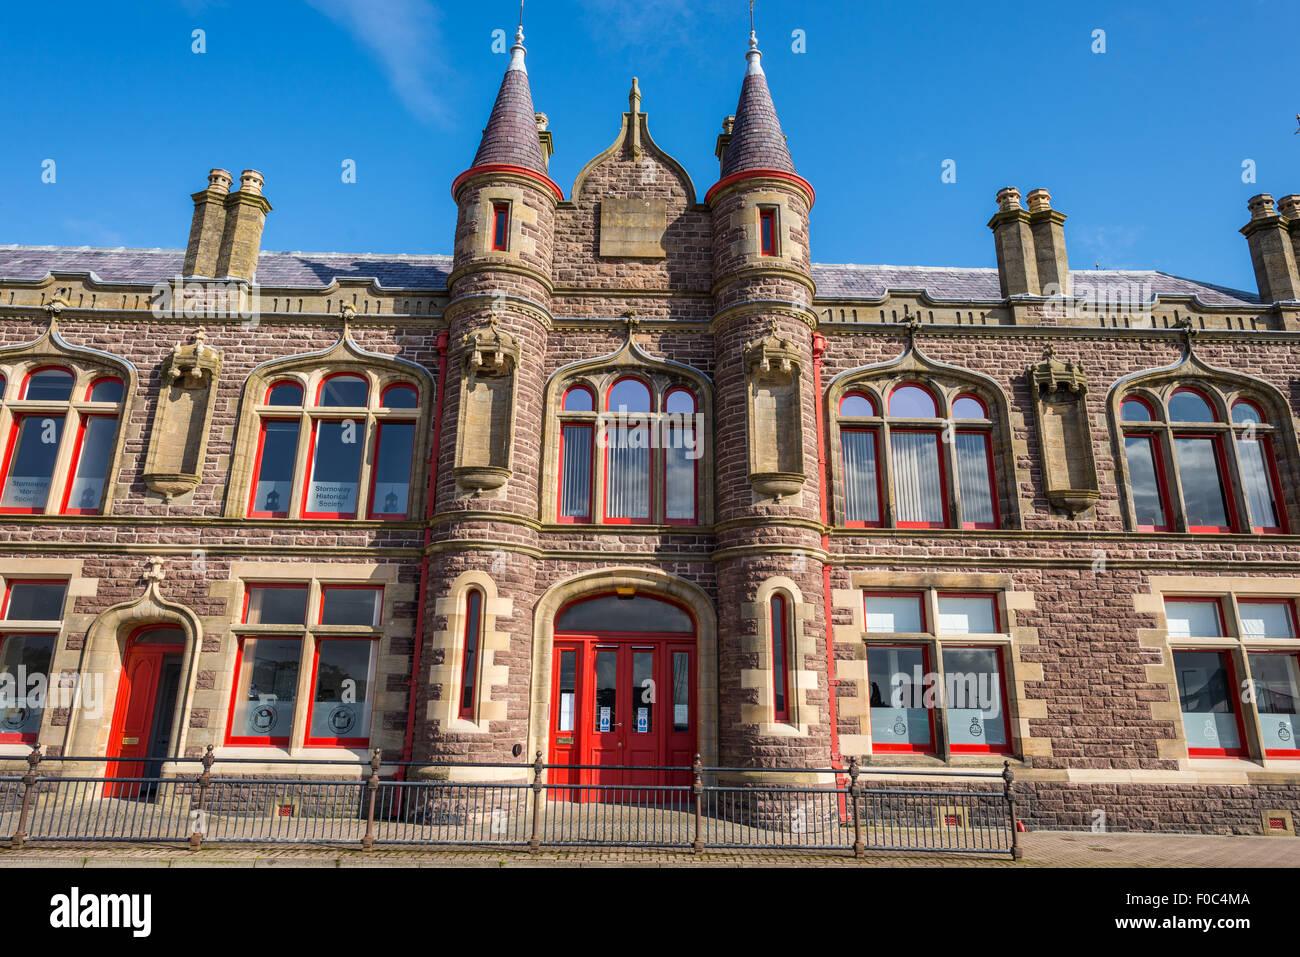 Stornoway Town Hall. - Stock Image